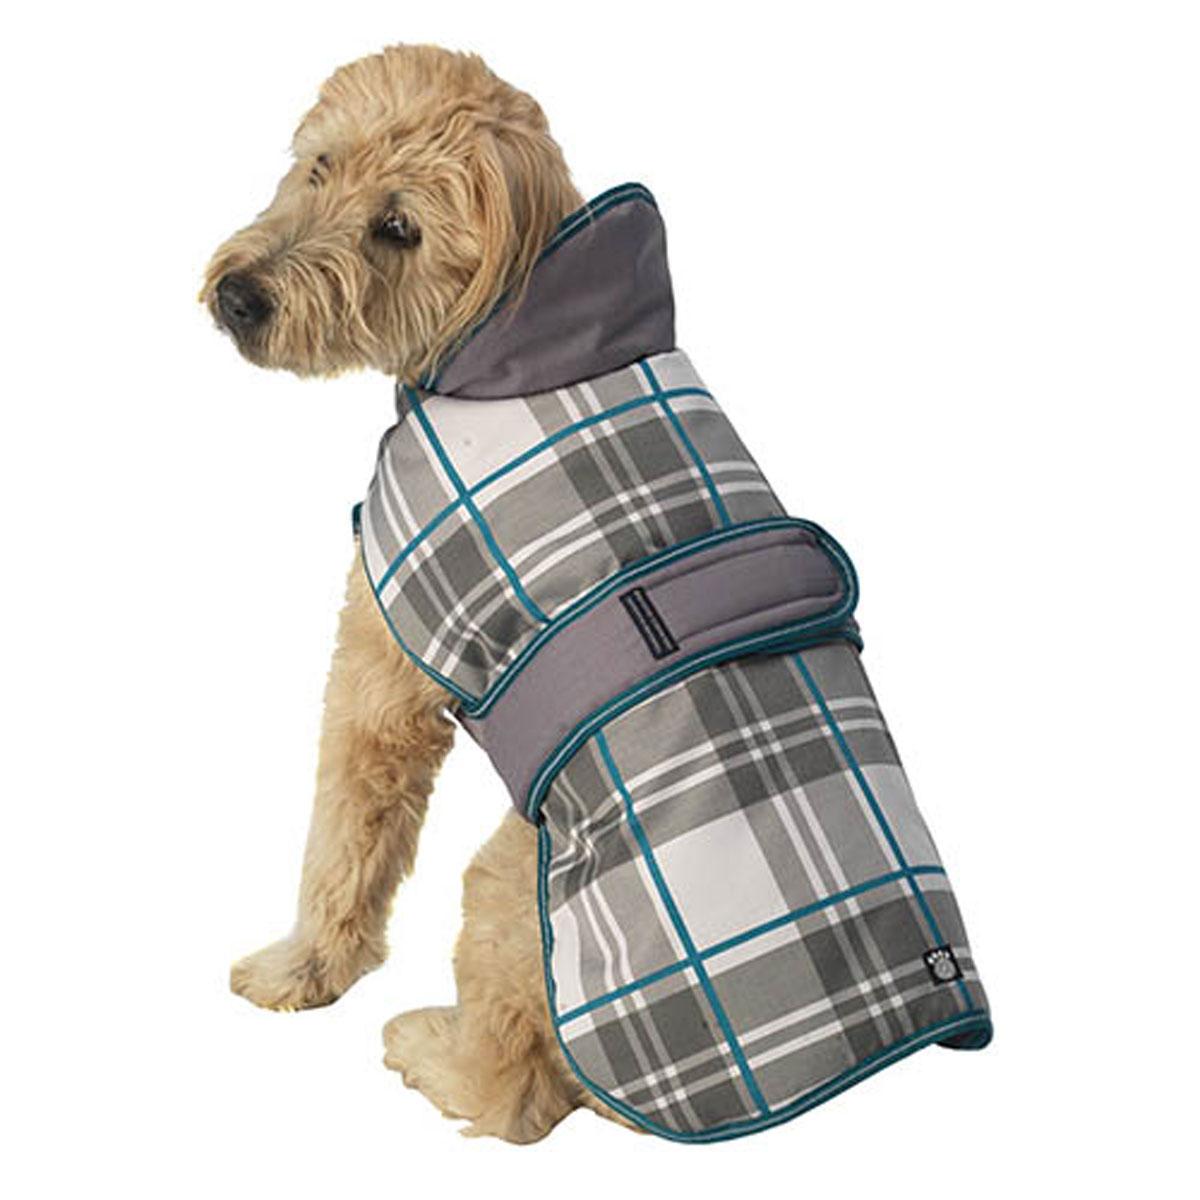 Kodiak Dog Coat - Aqua Plaid